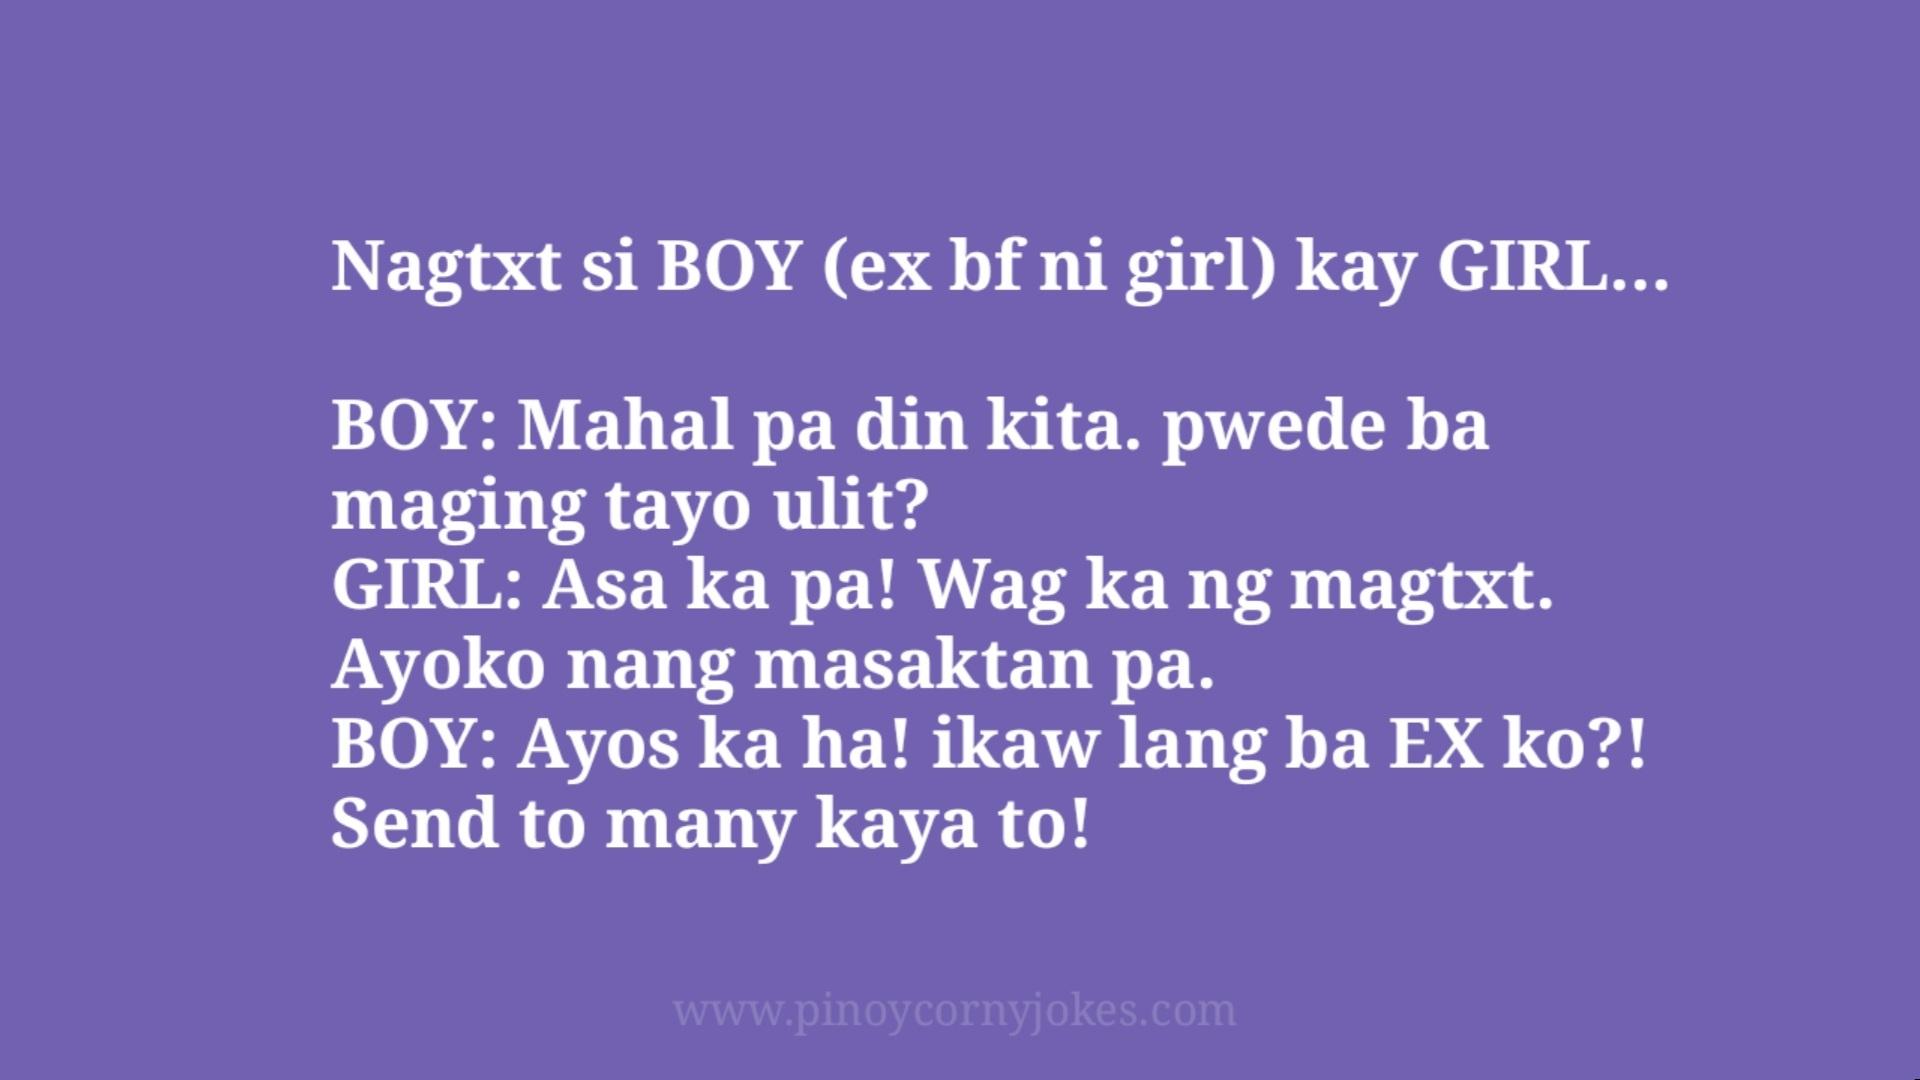 nag txt ex pinoy jokes corny